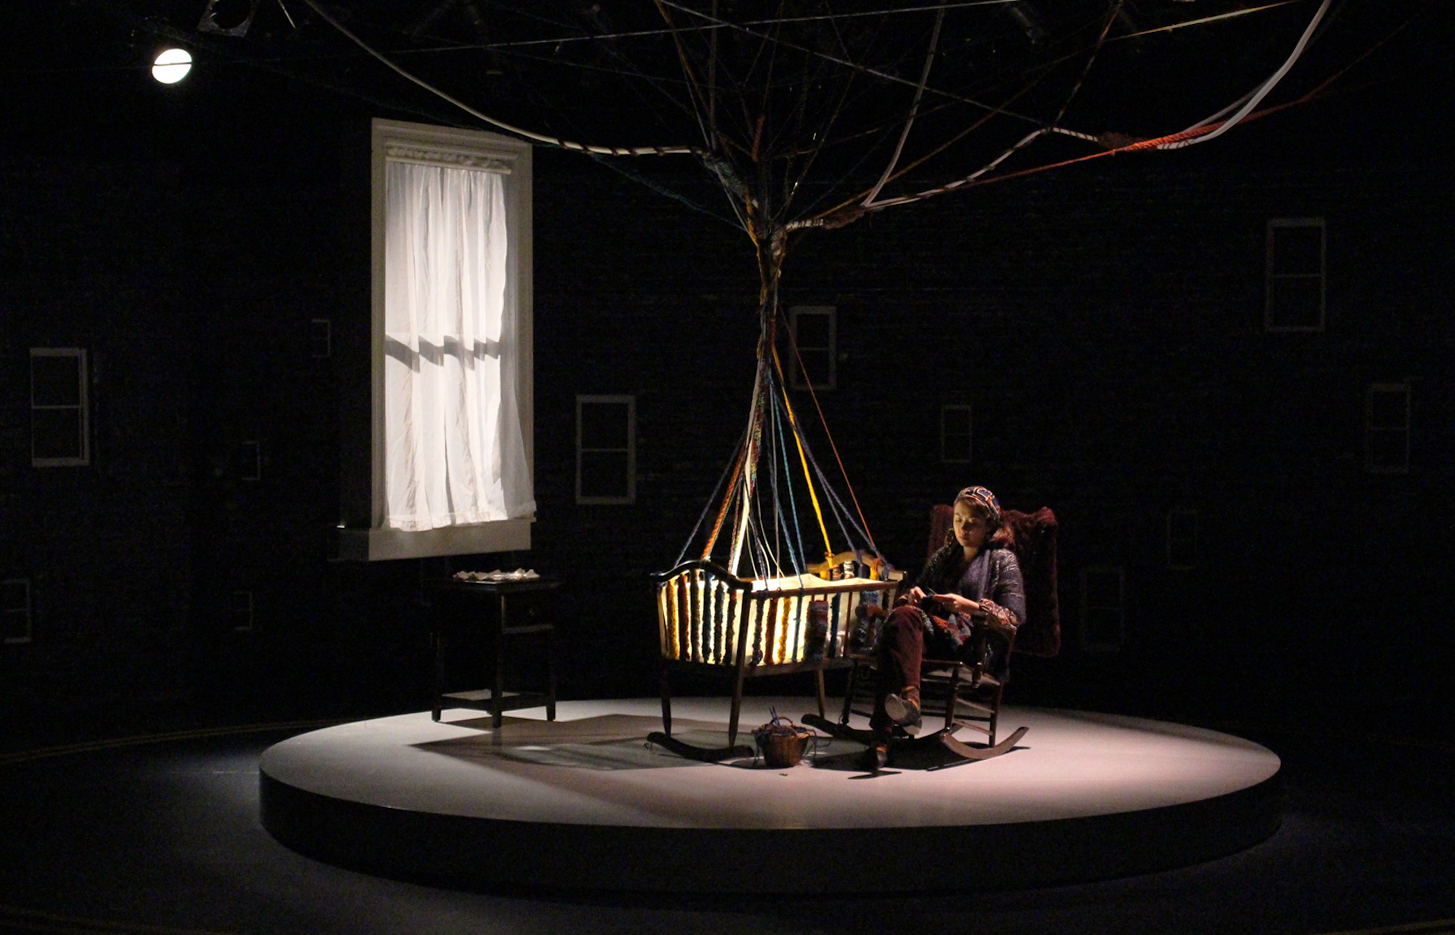 The Electric Baby - By Stefanie Zadravec * Designed by Reid Thompson, Cesca Wolos-Fonteno, Becky Bodurtha & Palmer Hefferan * Fordham University, 2016